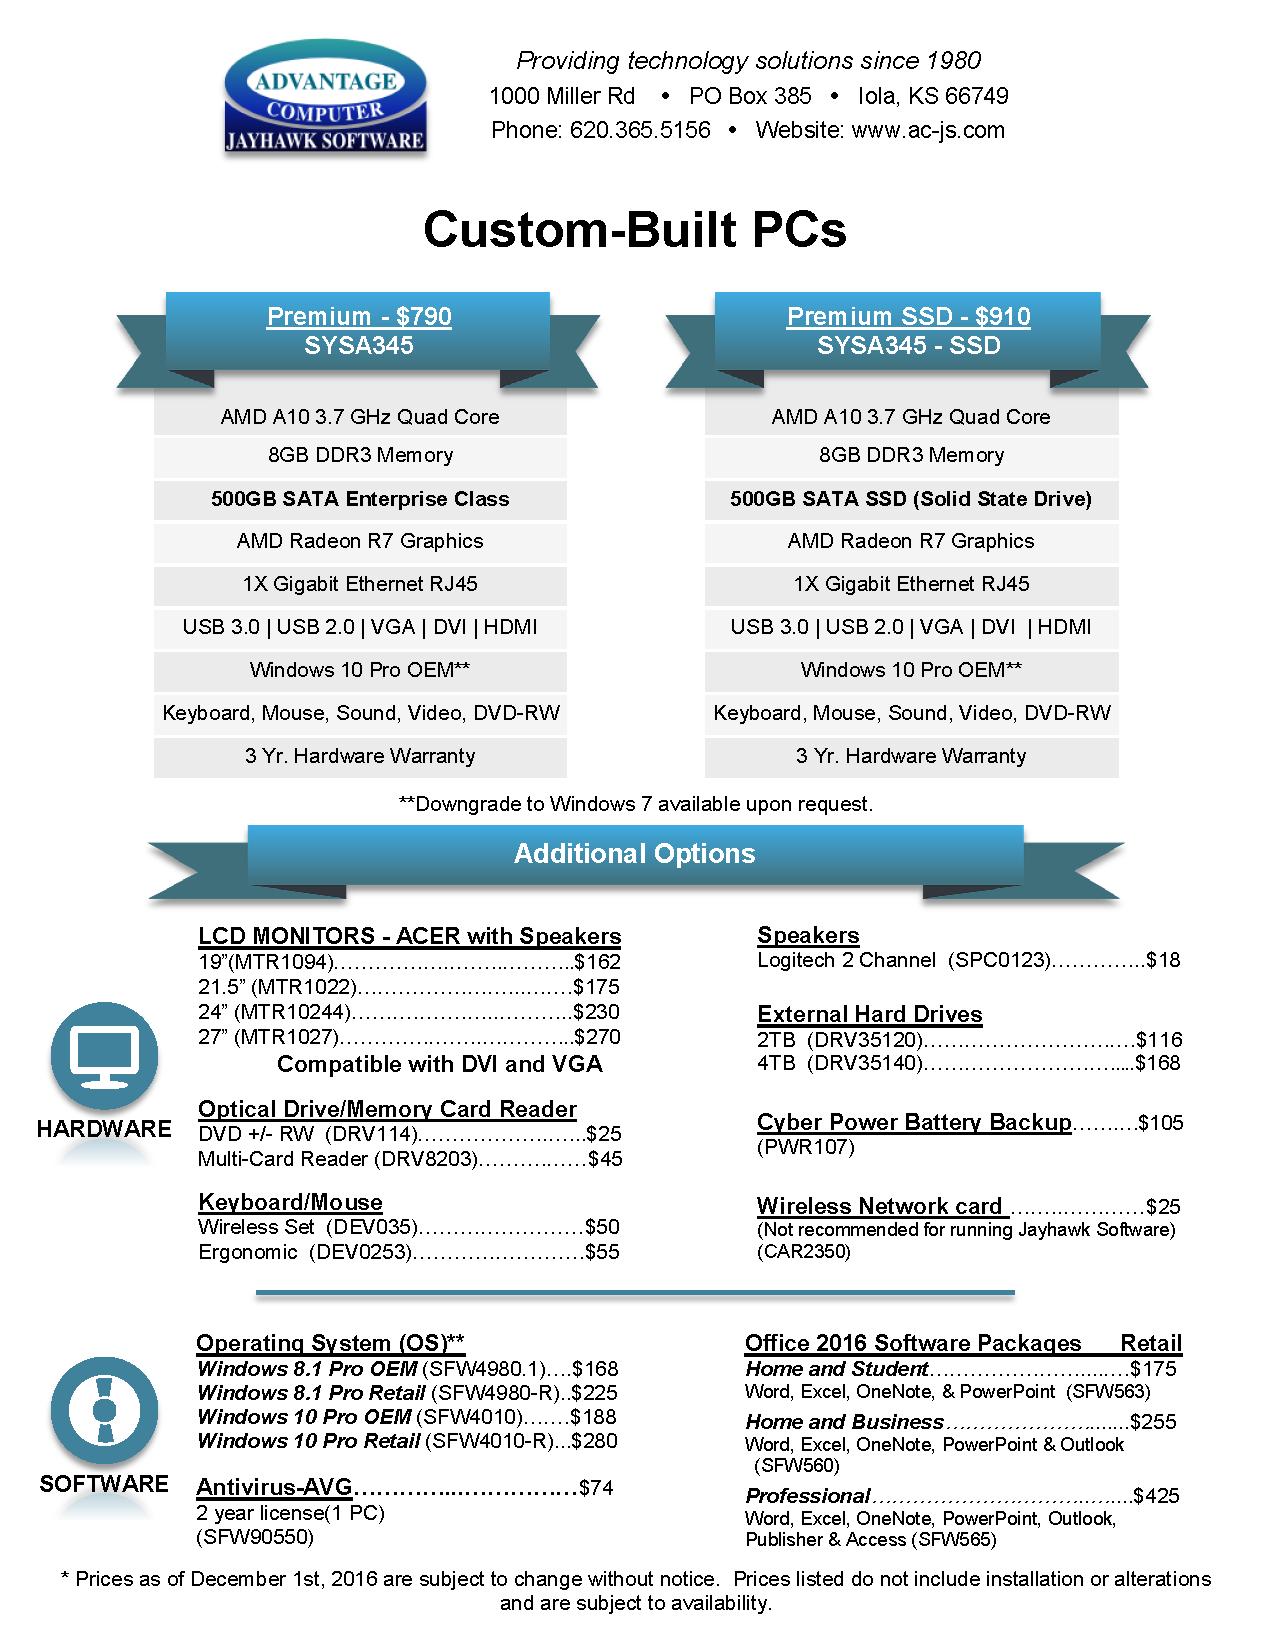 custom built PCs, computer, sale, SSD, advantage computers, jayhawk software